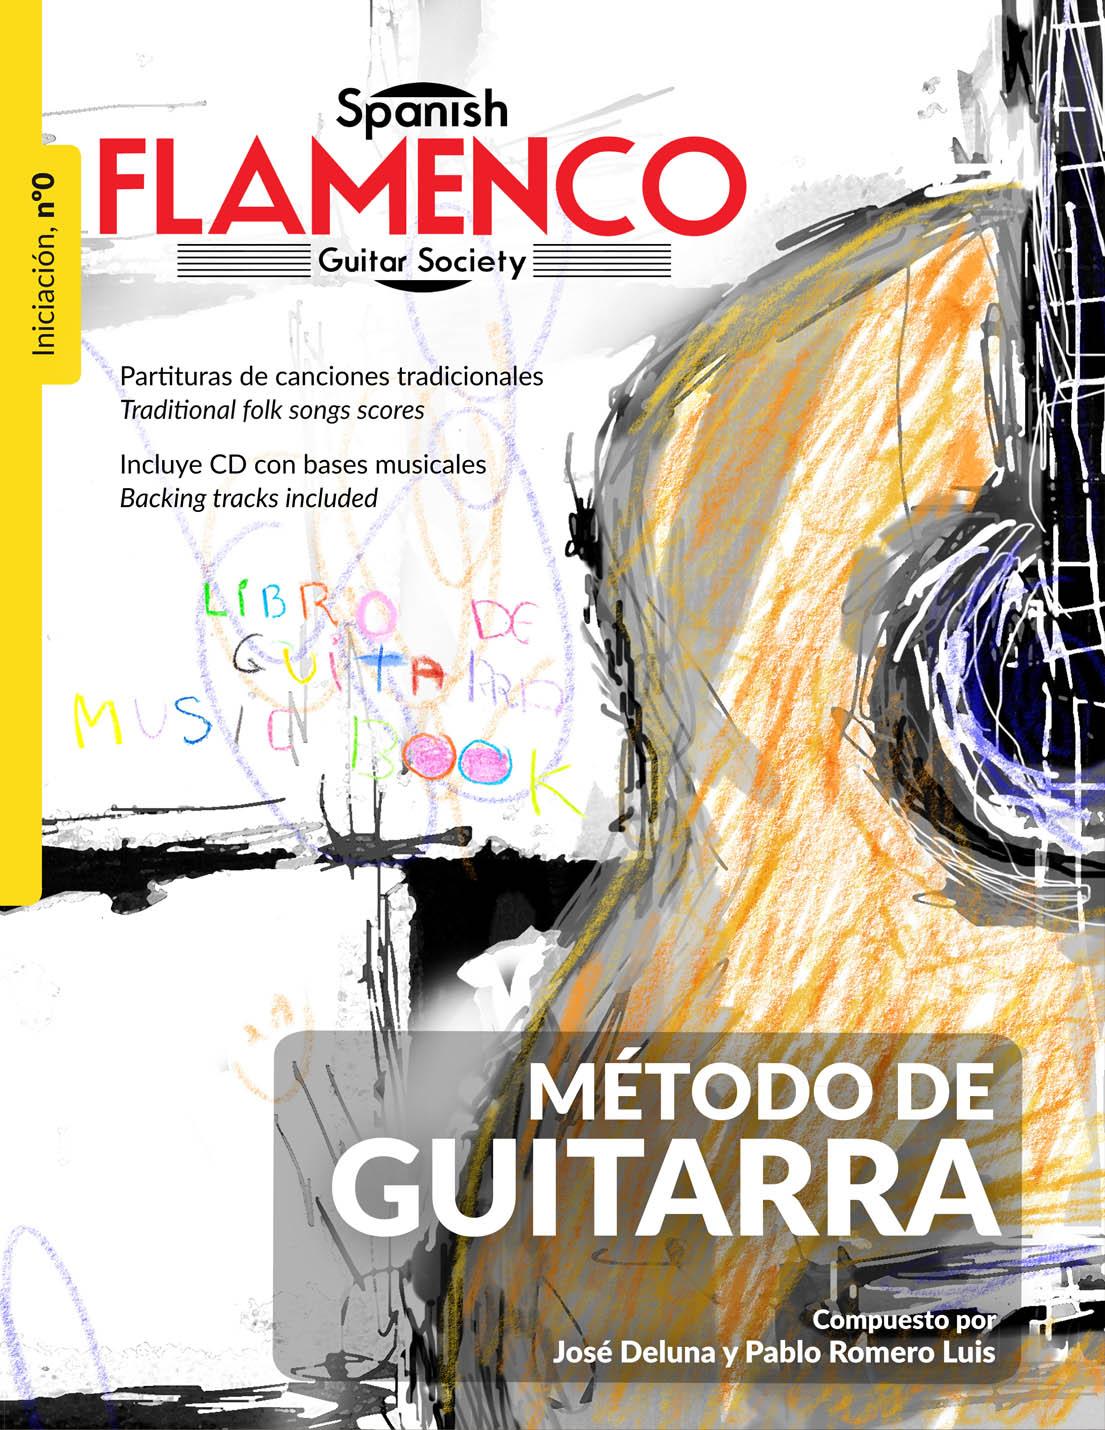 Flamenco Method